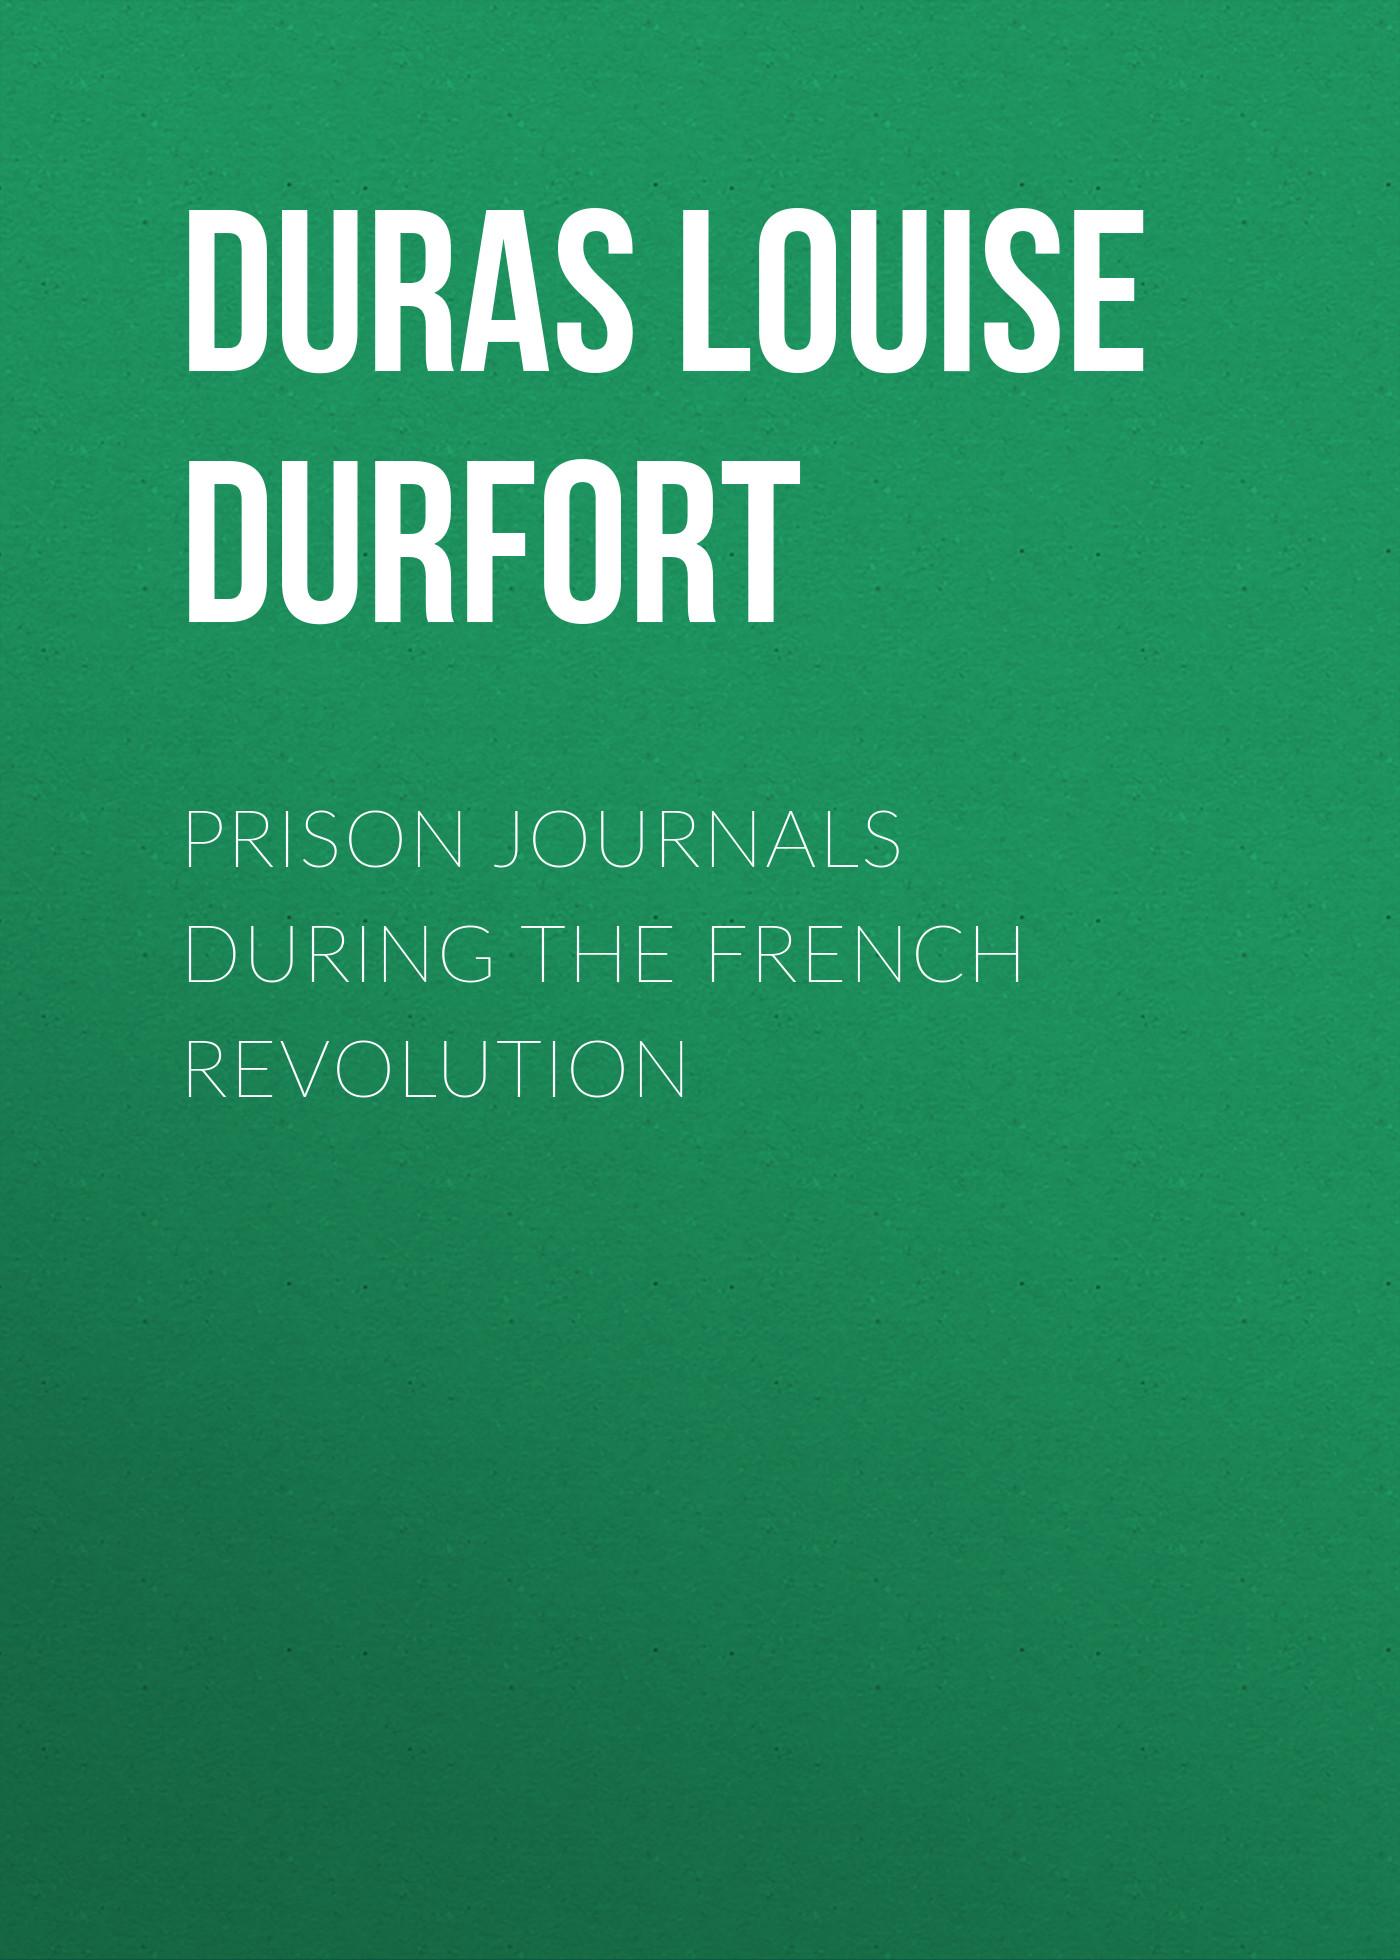 Duras Louise Henriette Charlotte Philippine (de Noailles) de Durfort Prison Journals During the French Revolution